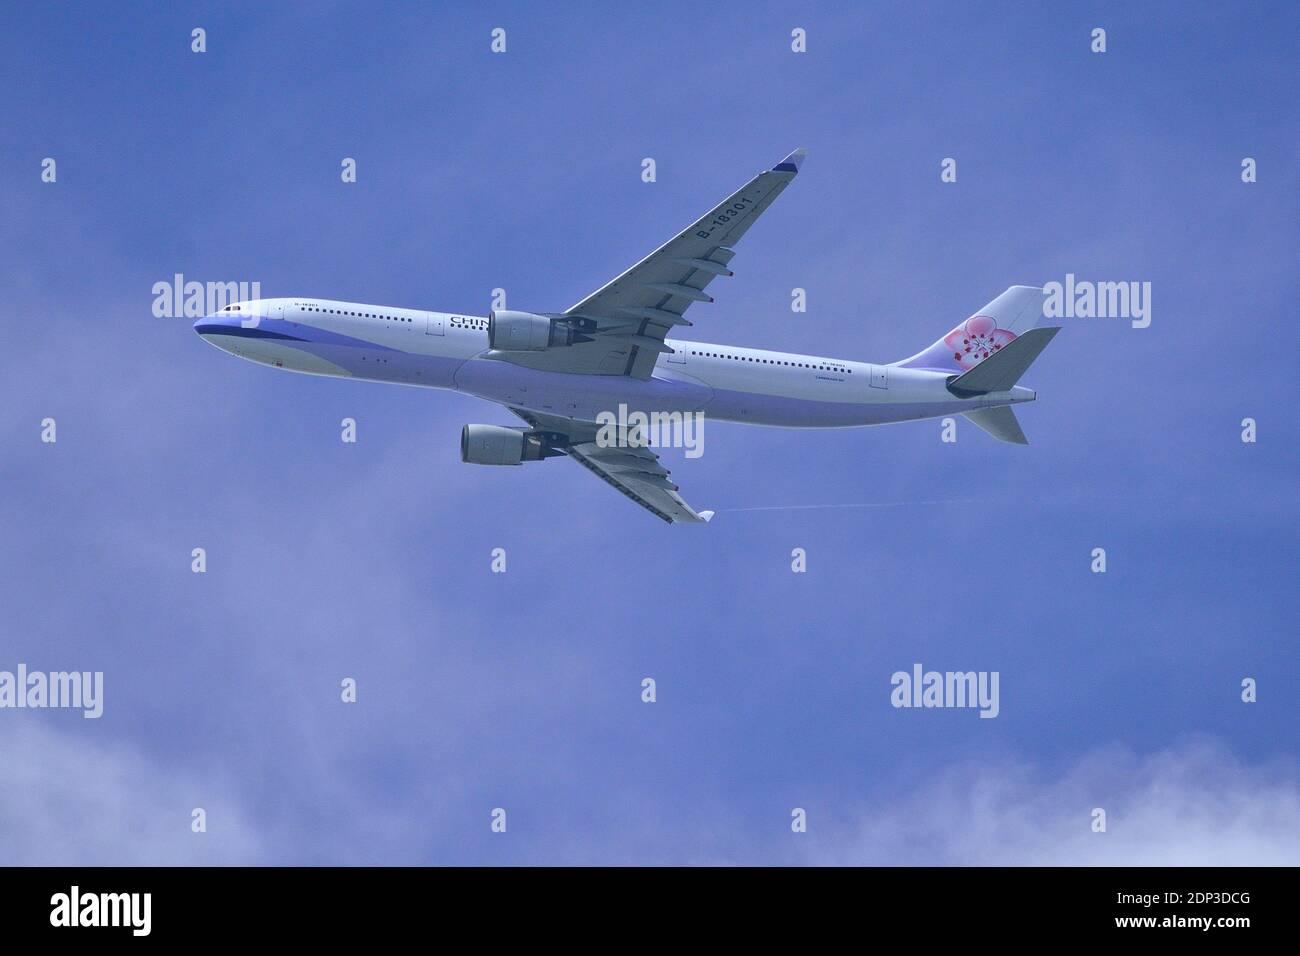 China Airlines, Taiwan, Airbus, A330-300, B-18301, Final approach, Landing, Tokyo Haneda Airport, Tokyo, Japan Stock Photo